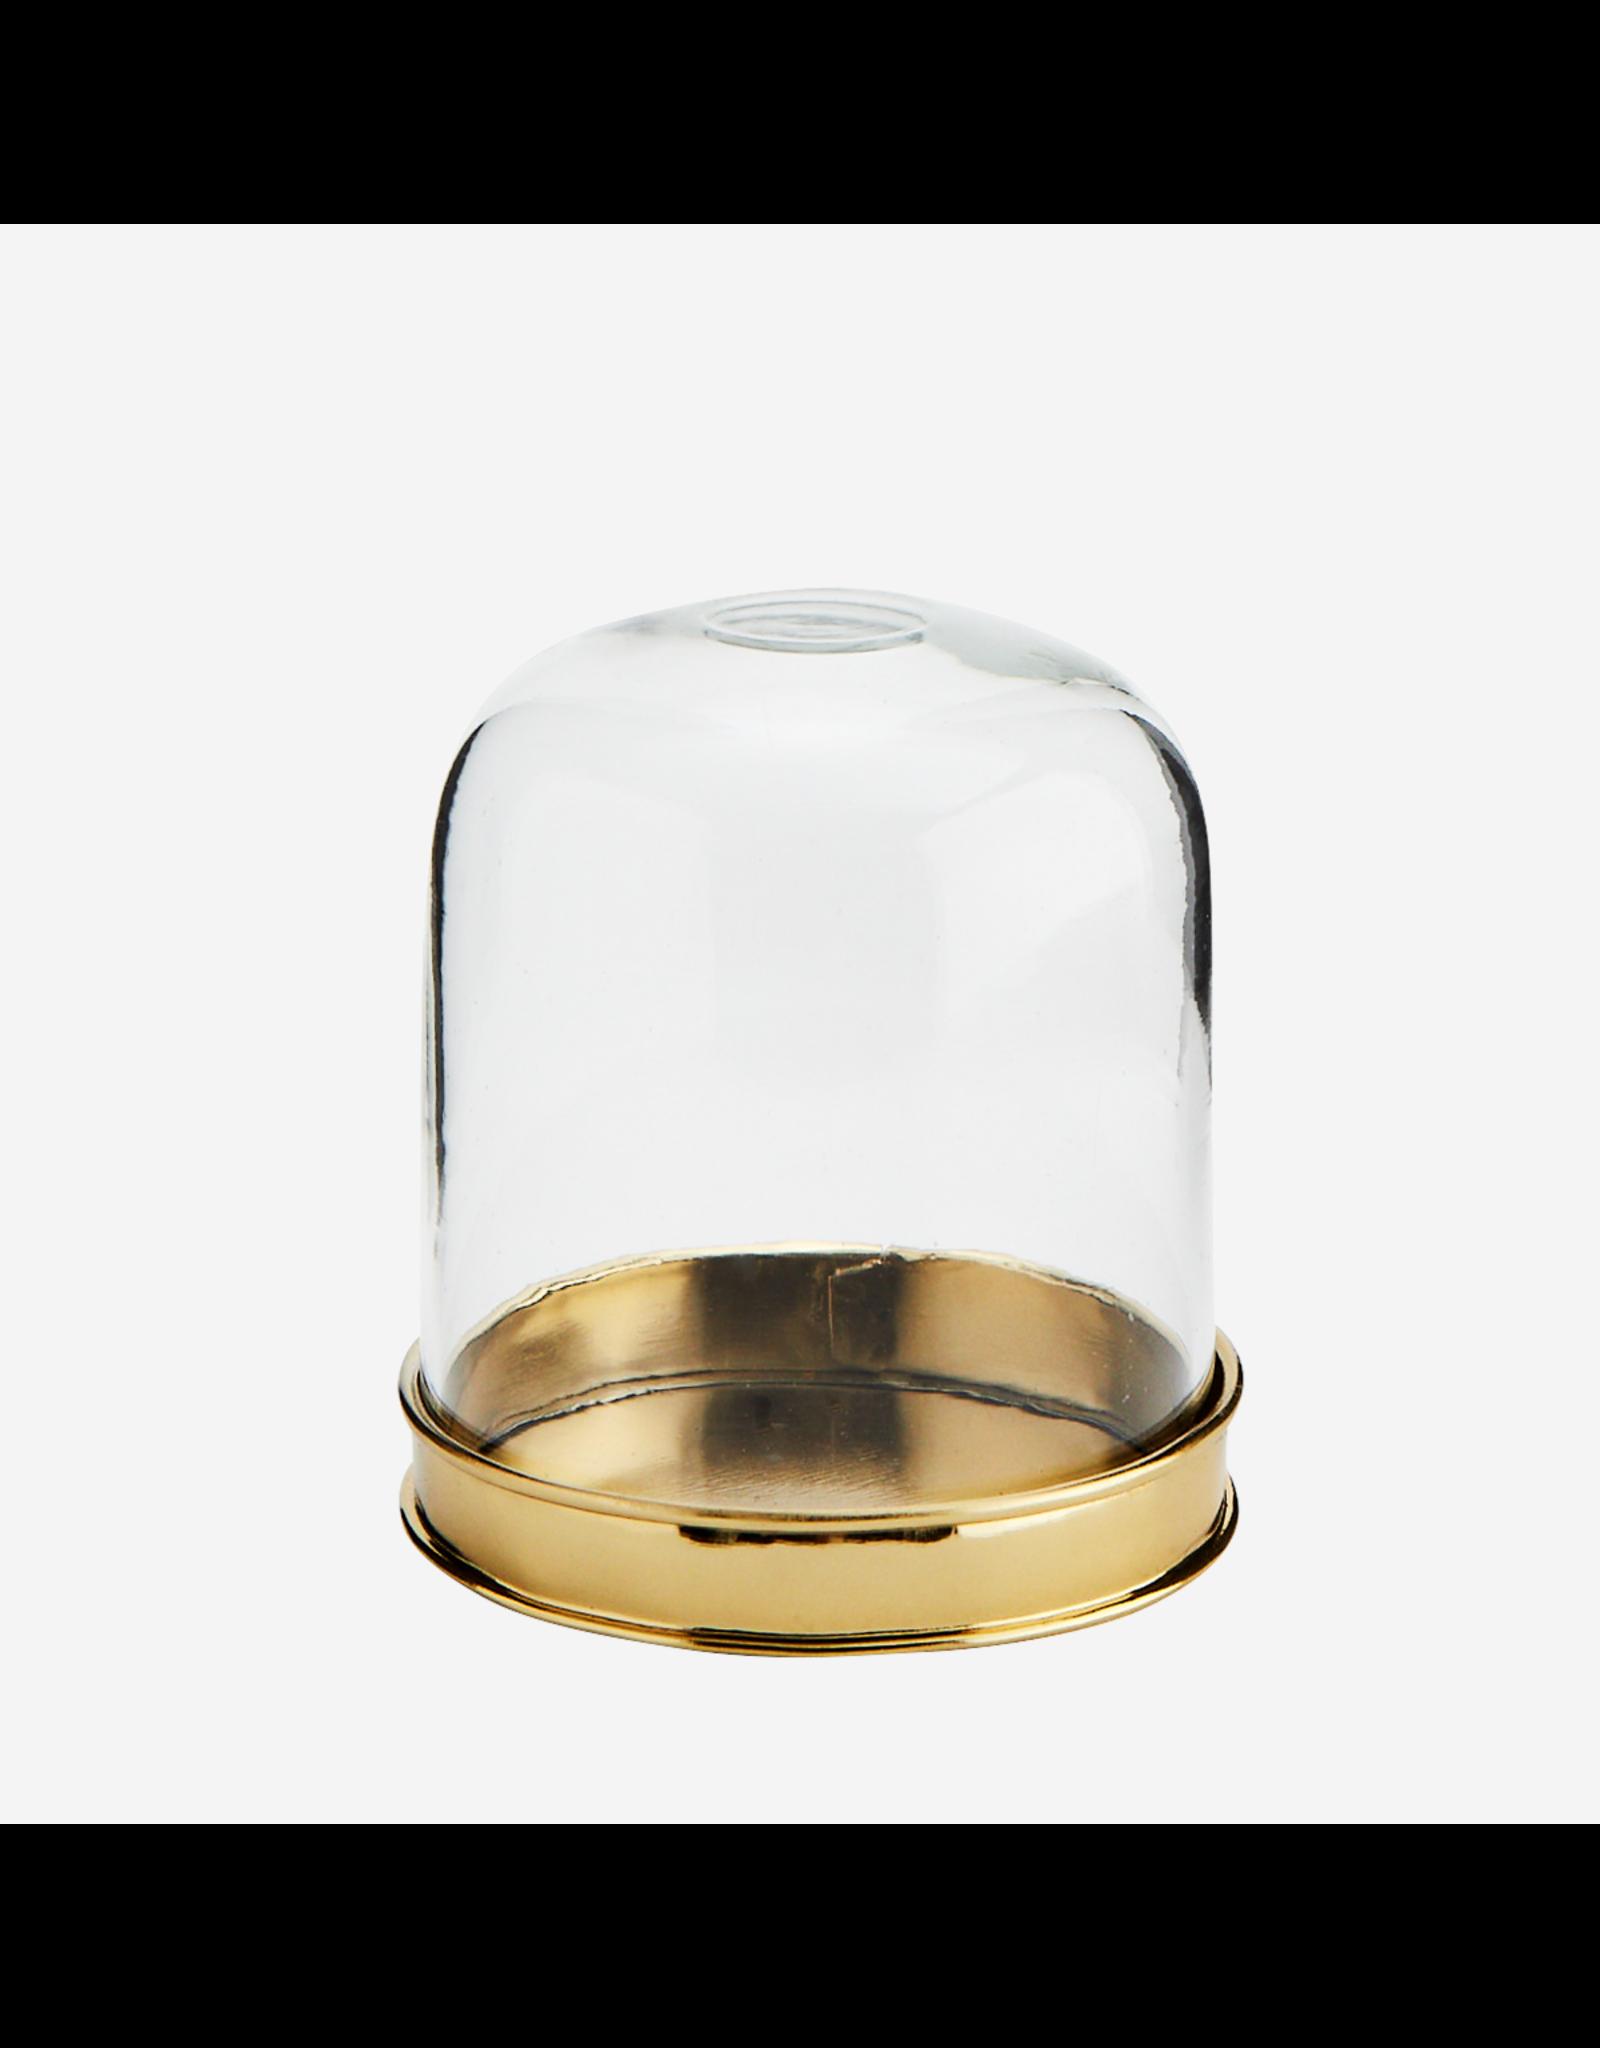 Madam Stolz Stolp glas met gouden bodem